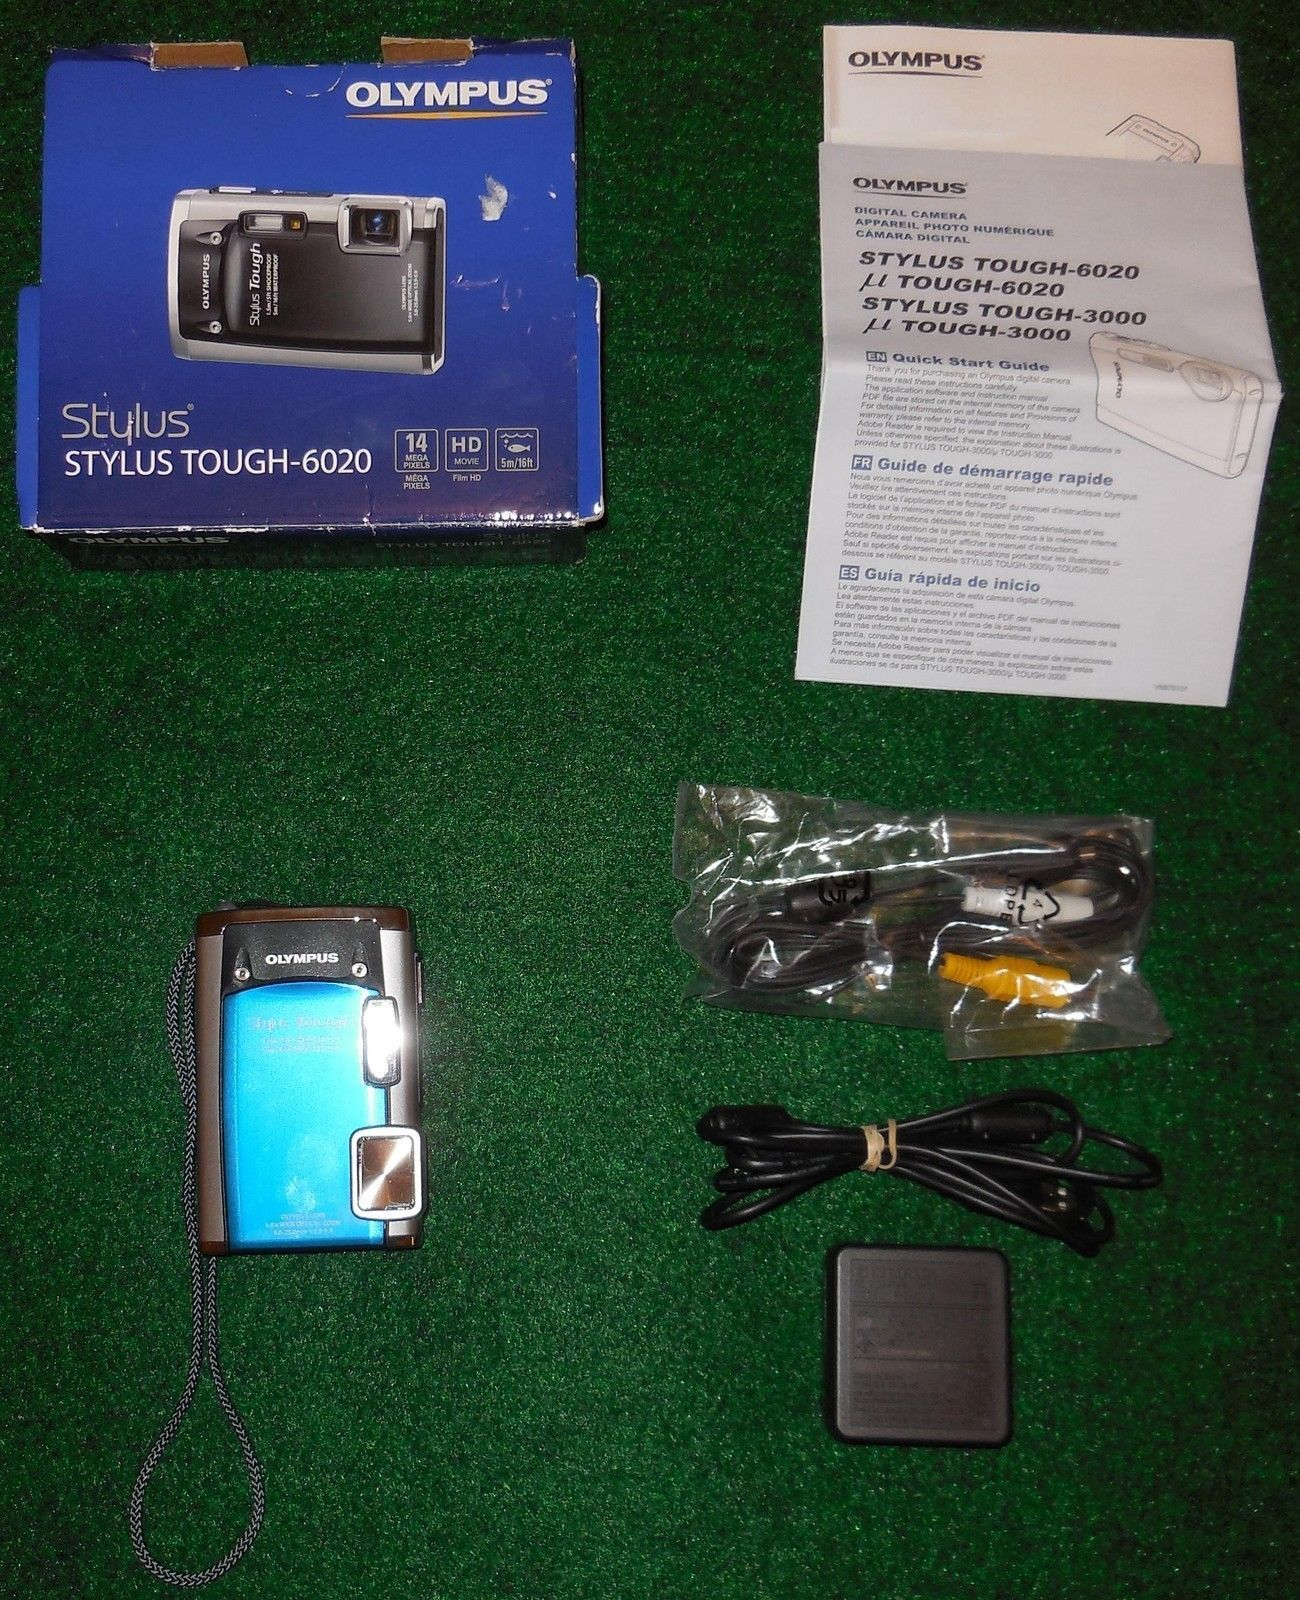 Olympus Digital Camera Blue Stylus Tough 6020 Never Used In Original Box Digital Camera Olympus Digital Camera Olympus